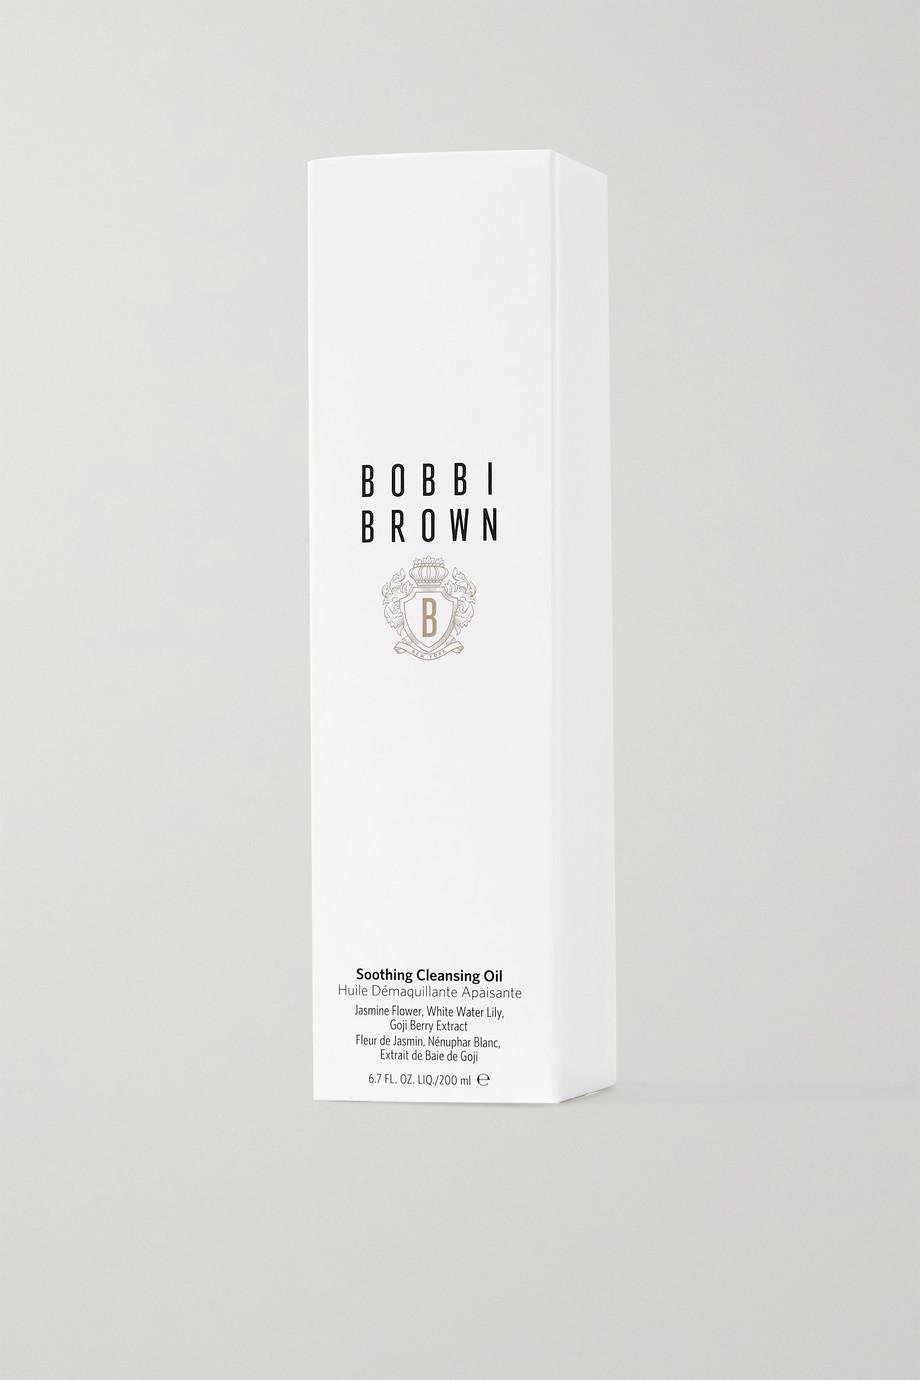 Bobbi Brown Soothing Cleansing Oil, 200ml